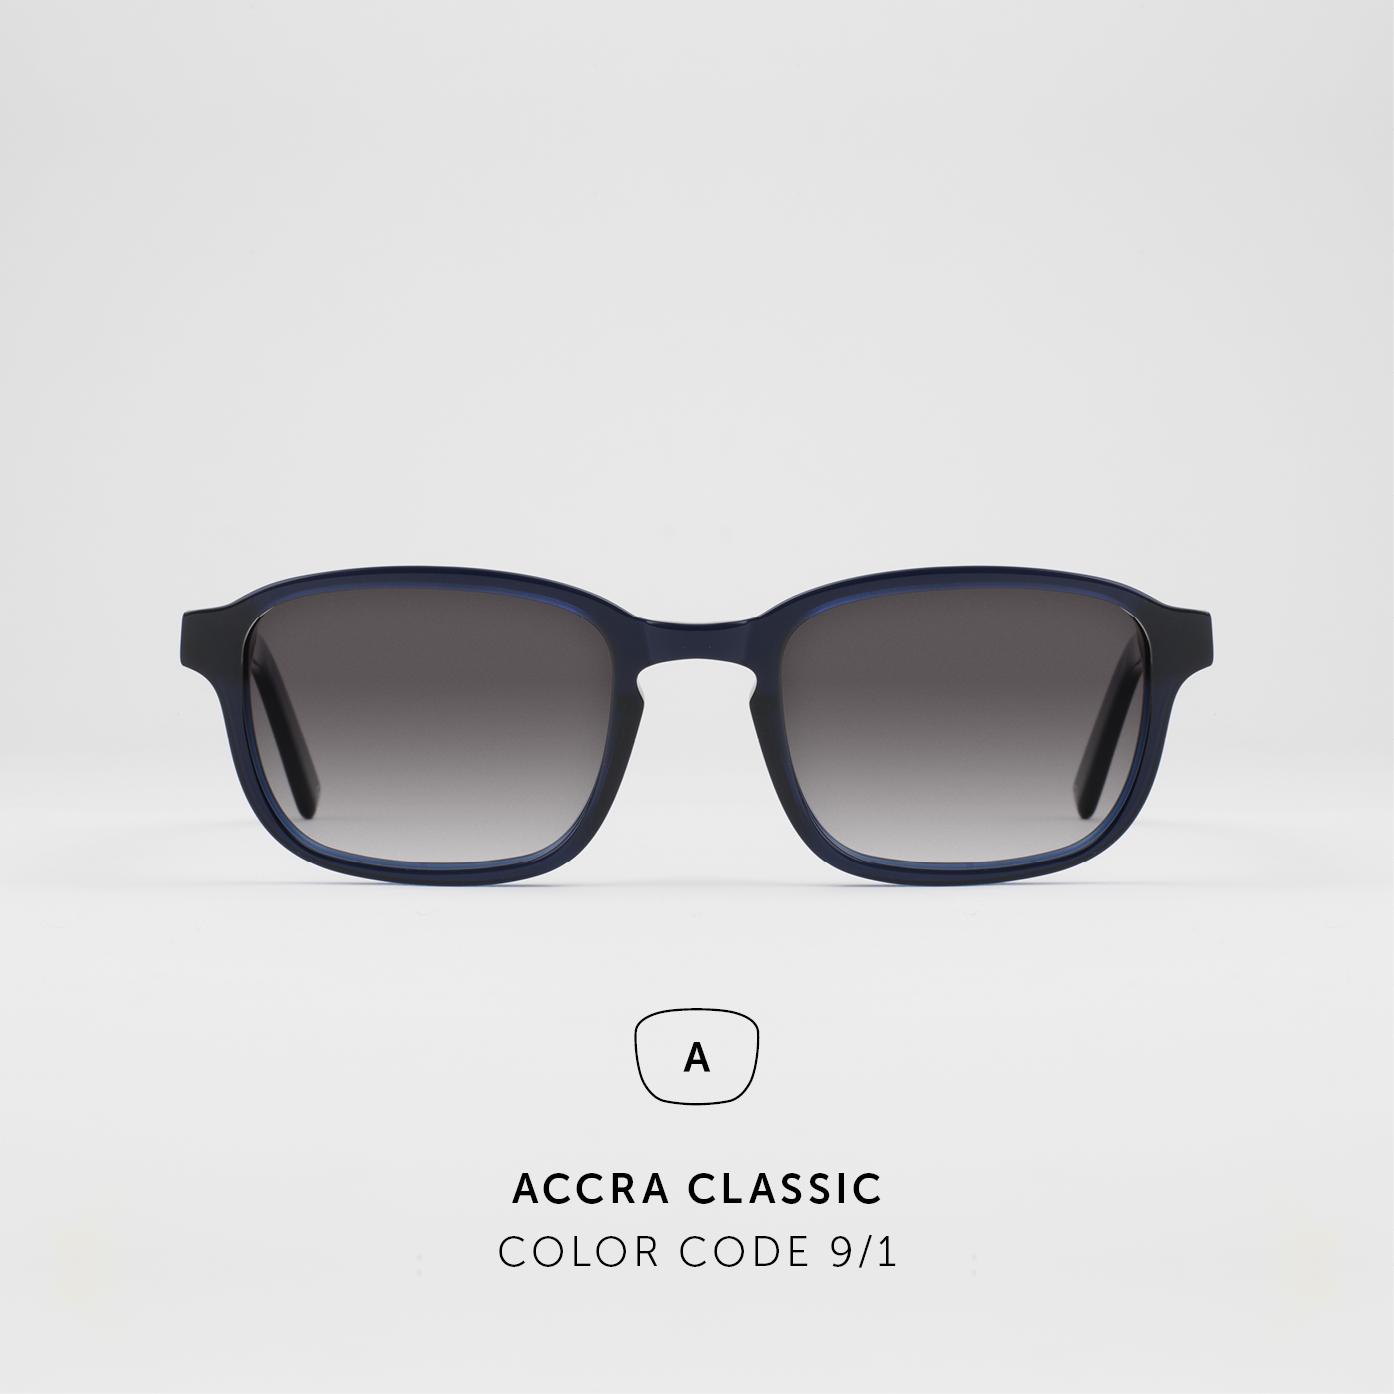 AccraClassic35.jpg